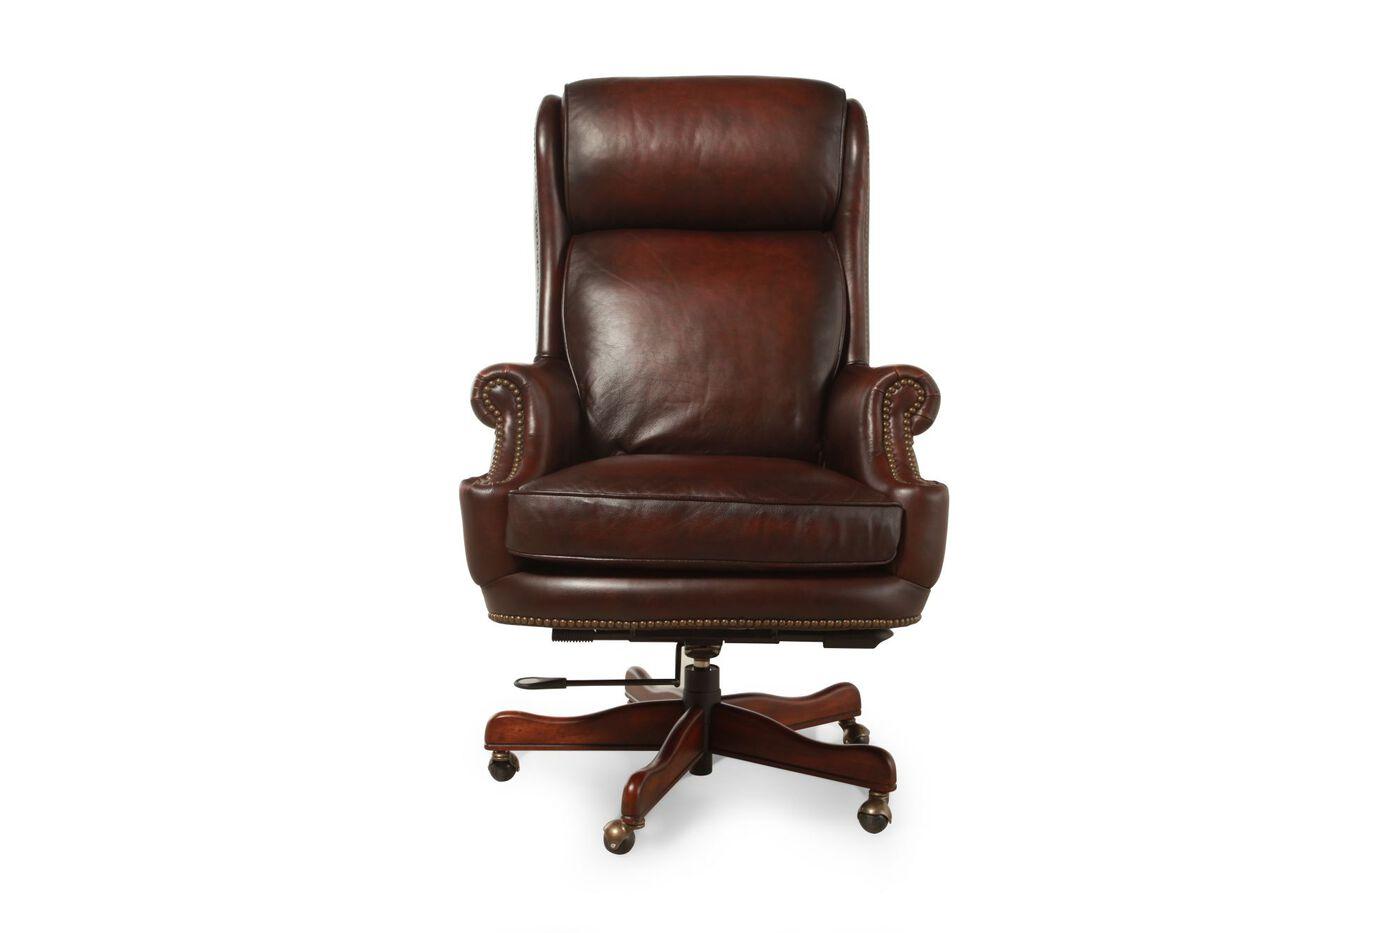 Leather Ergonomic Executive Swivel Tilt Chair In Rich